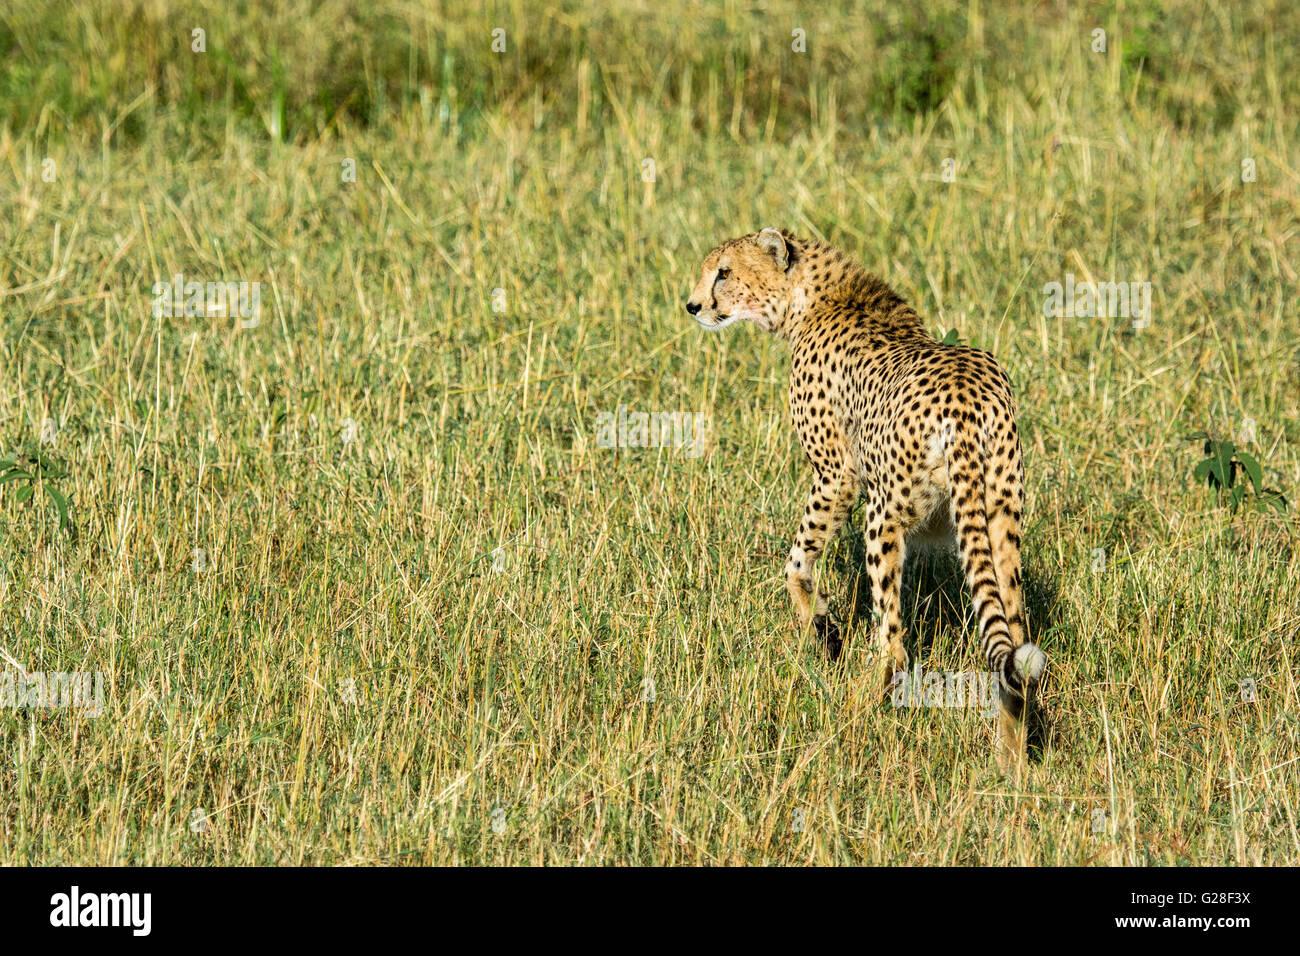 Einsame Erwachsene Geparden, Acinonyx Jubatus, Wandern, auf der Suche nach Beute, Masai Mara National Reserve, Kenia, Stockbild